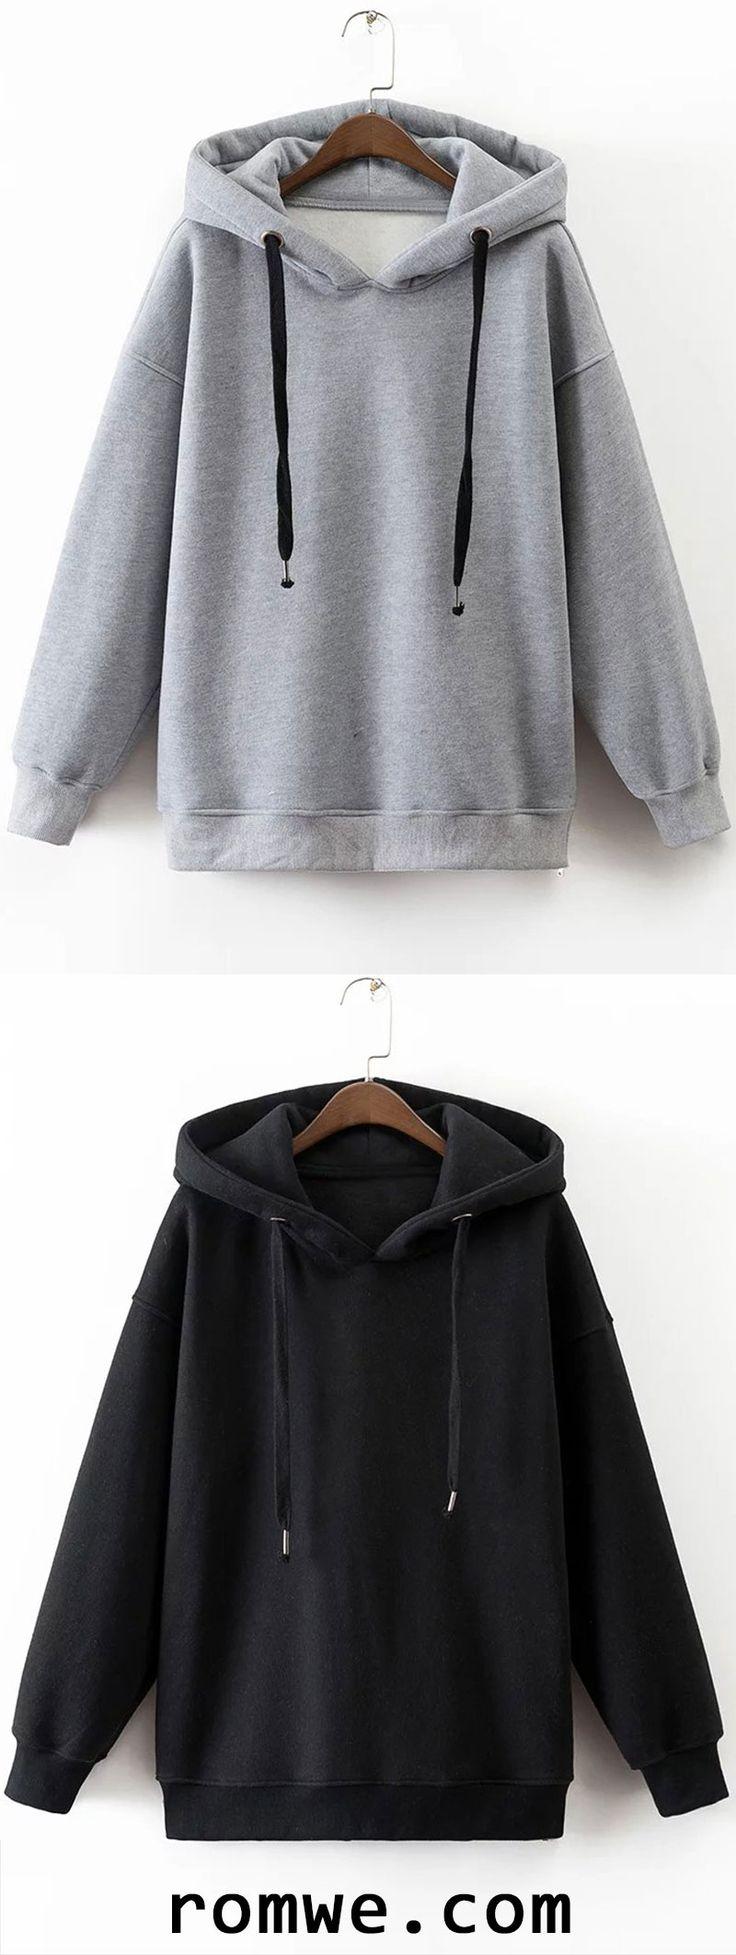 Drawstring Side Zipper Hooded Sweatshirt